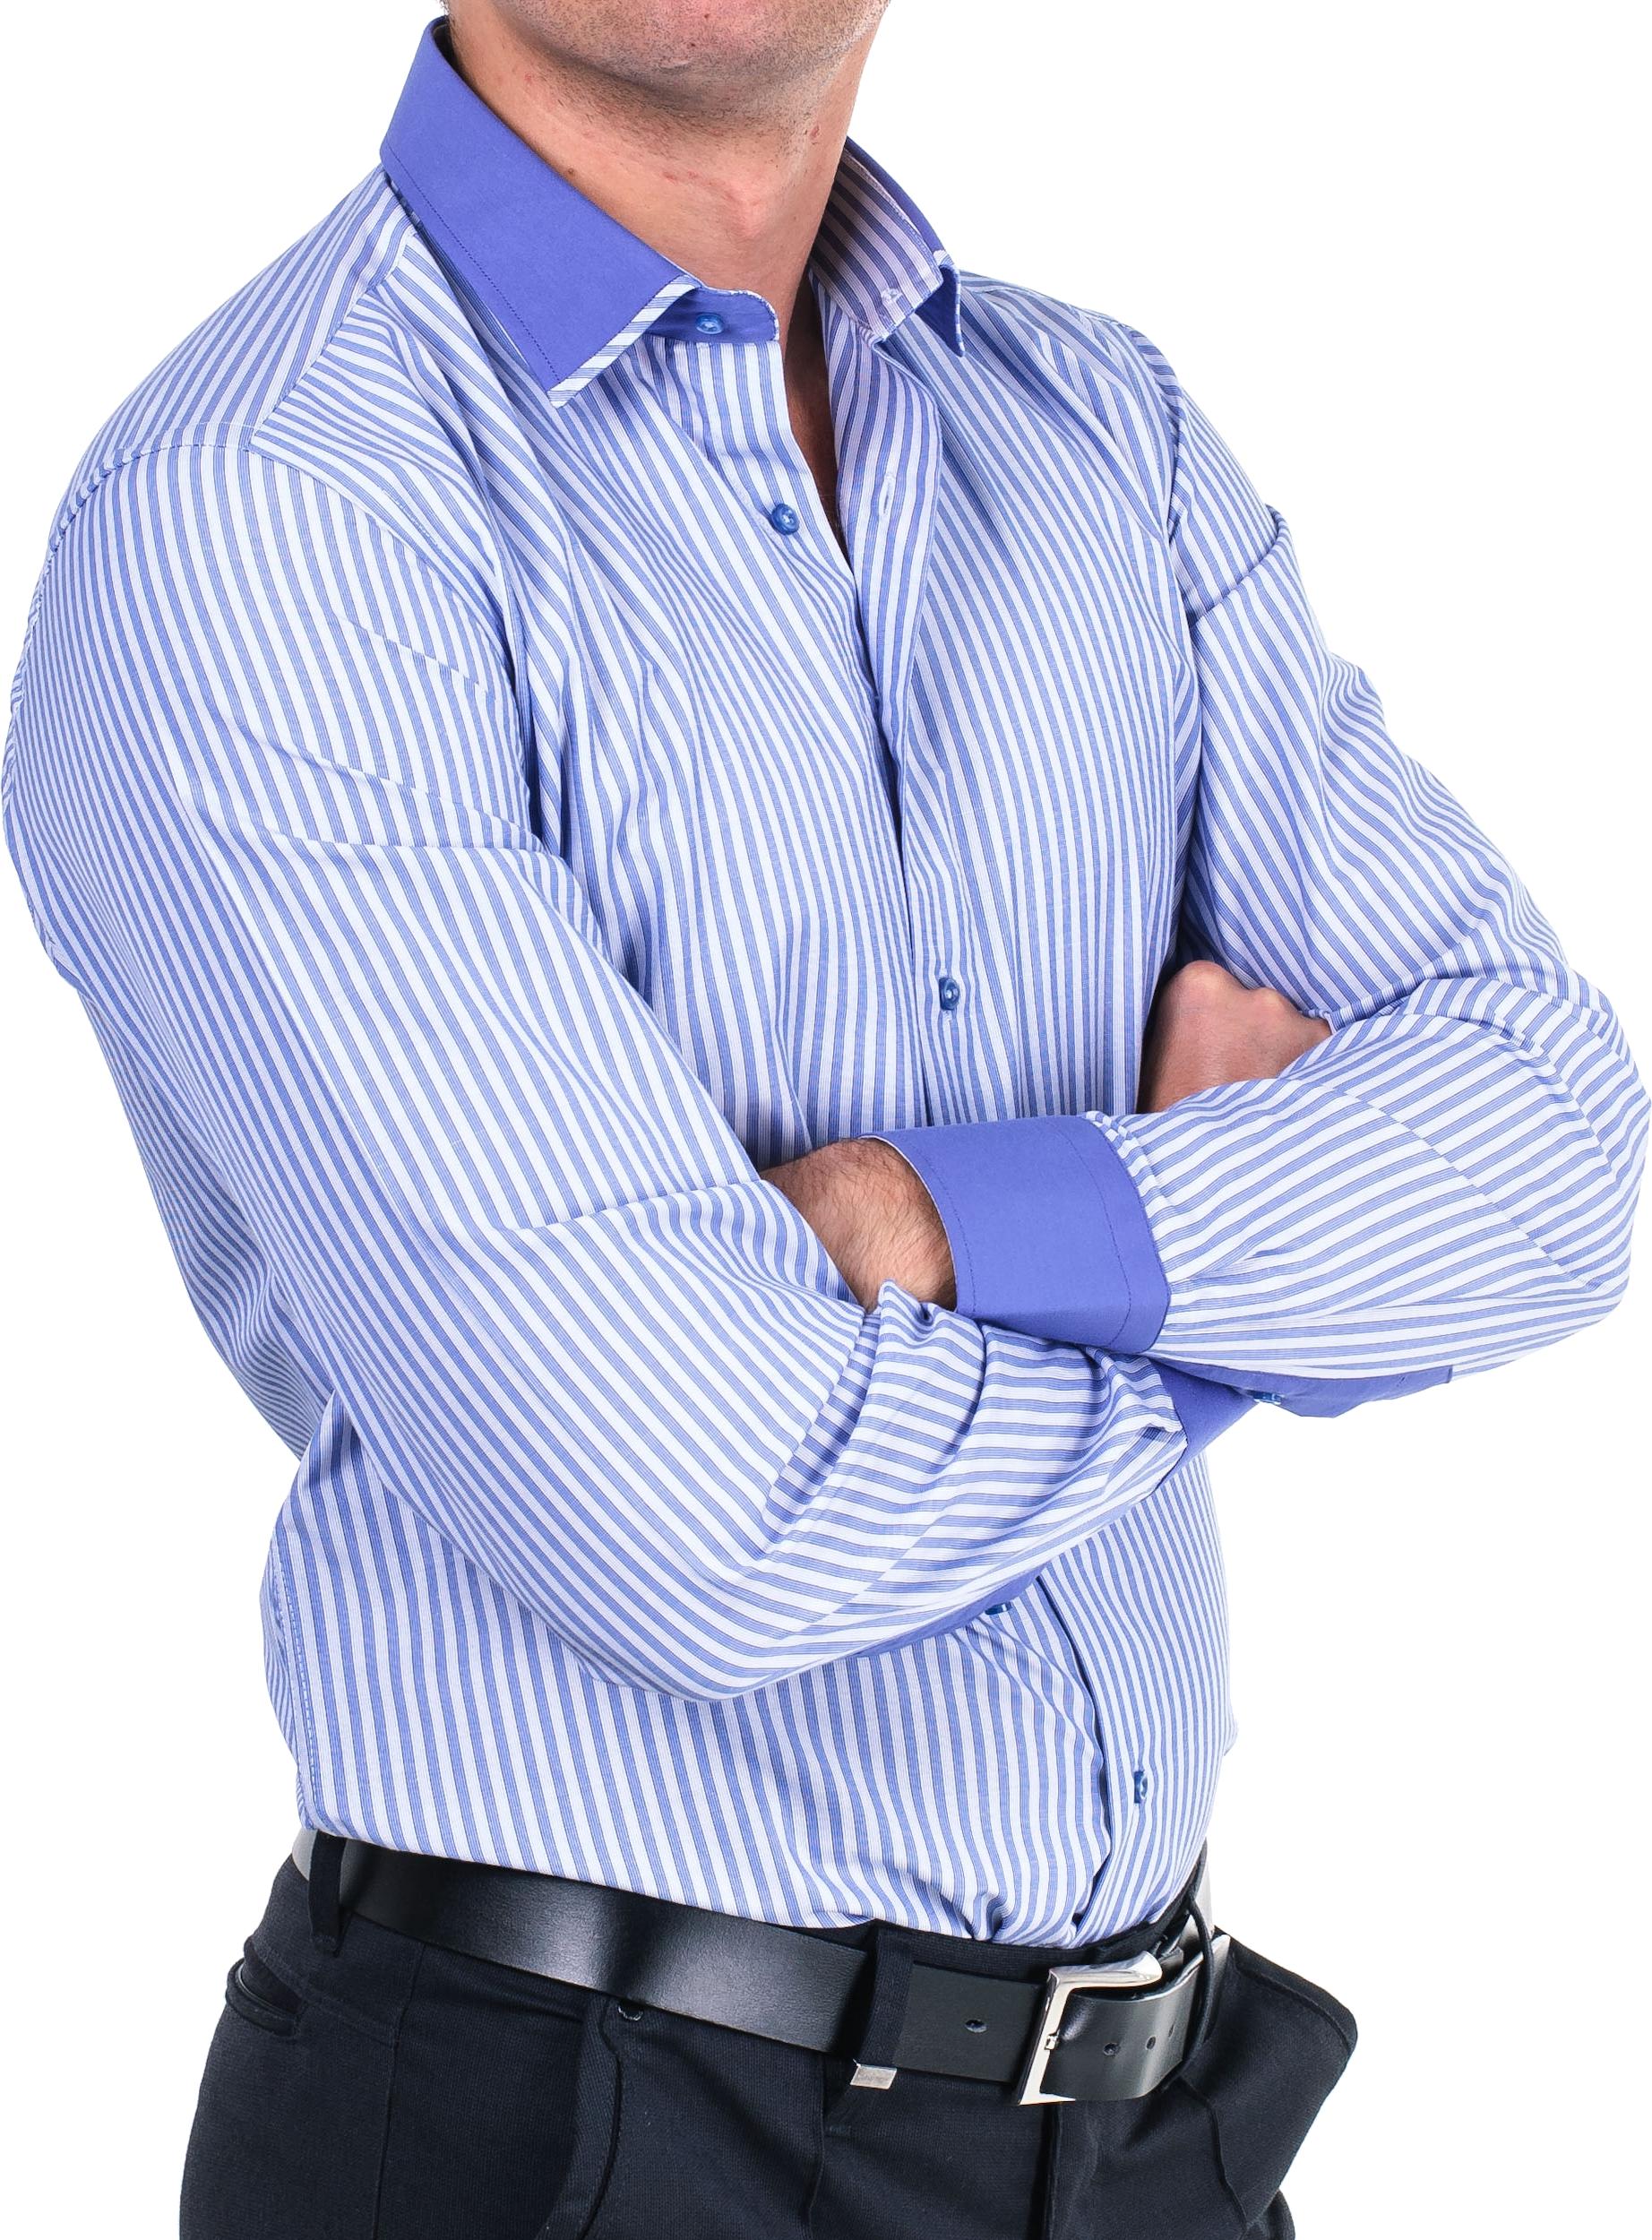 Blue Strip Full Fit Shirt PNG Image